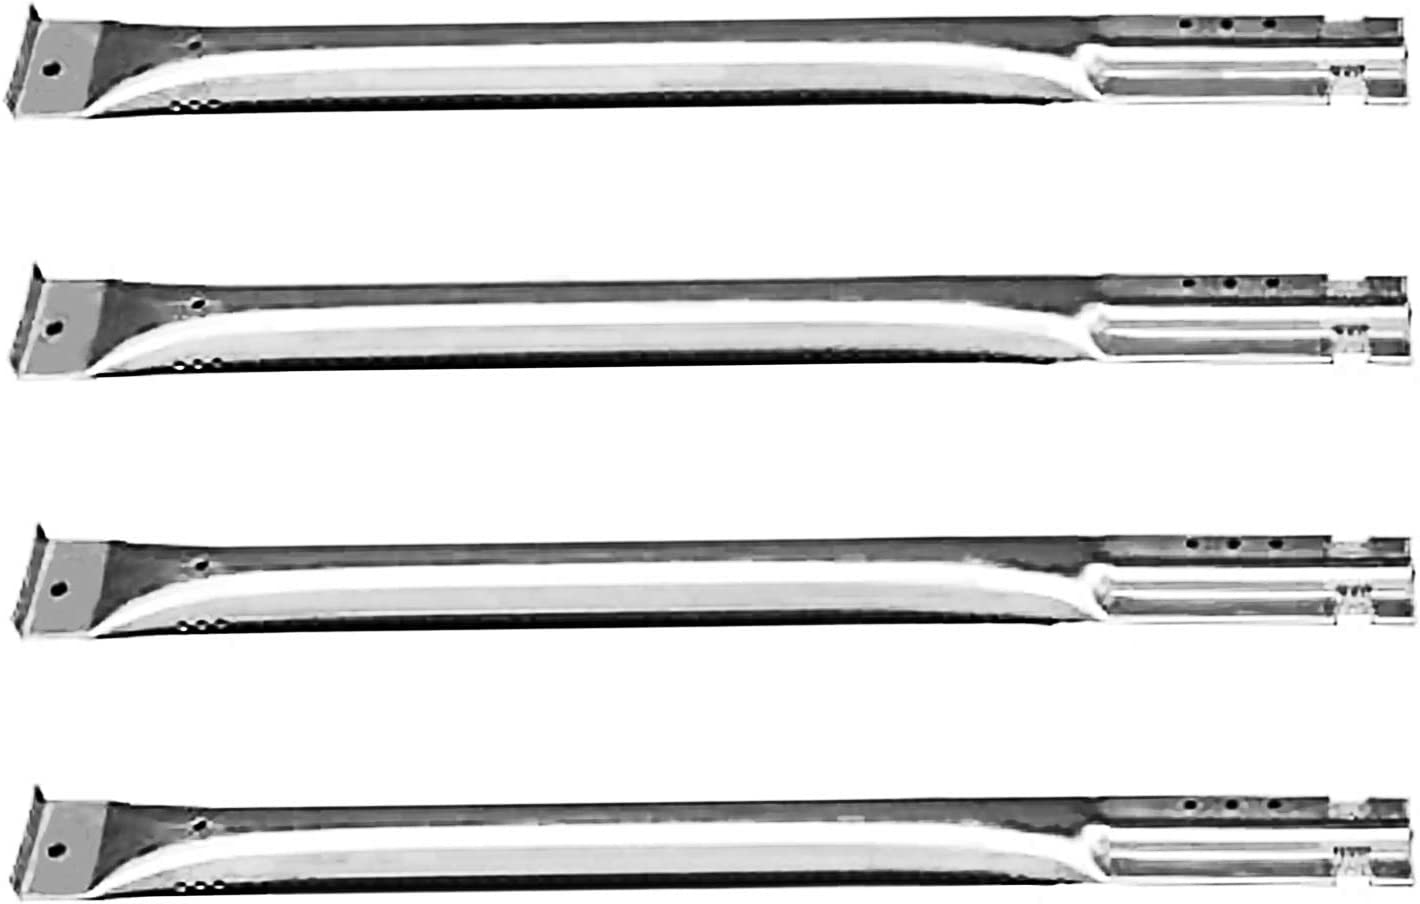 BBQ FUNLAND SB5591(4 팩)CHARBROIL FRONT AVENUE CHARMGLOW SEARS KENMORE CENTRO 및 기타 그릴 용 스트레이트 스테인레스 스틸 파이프 버너 교체